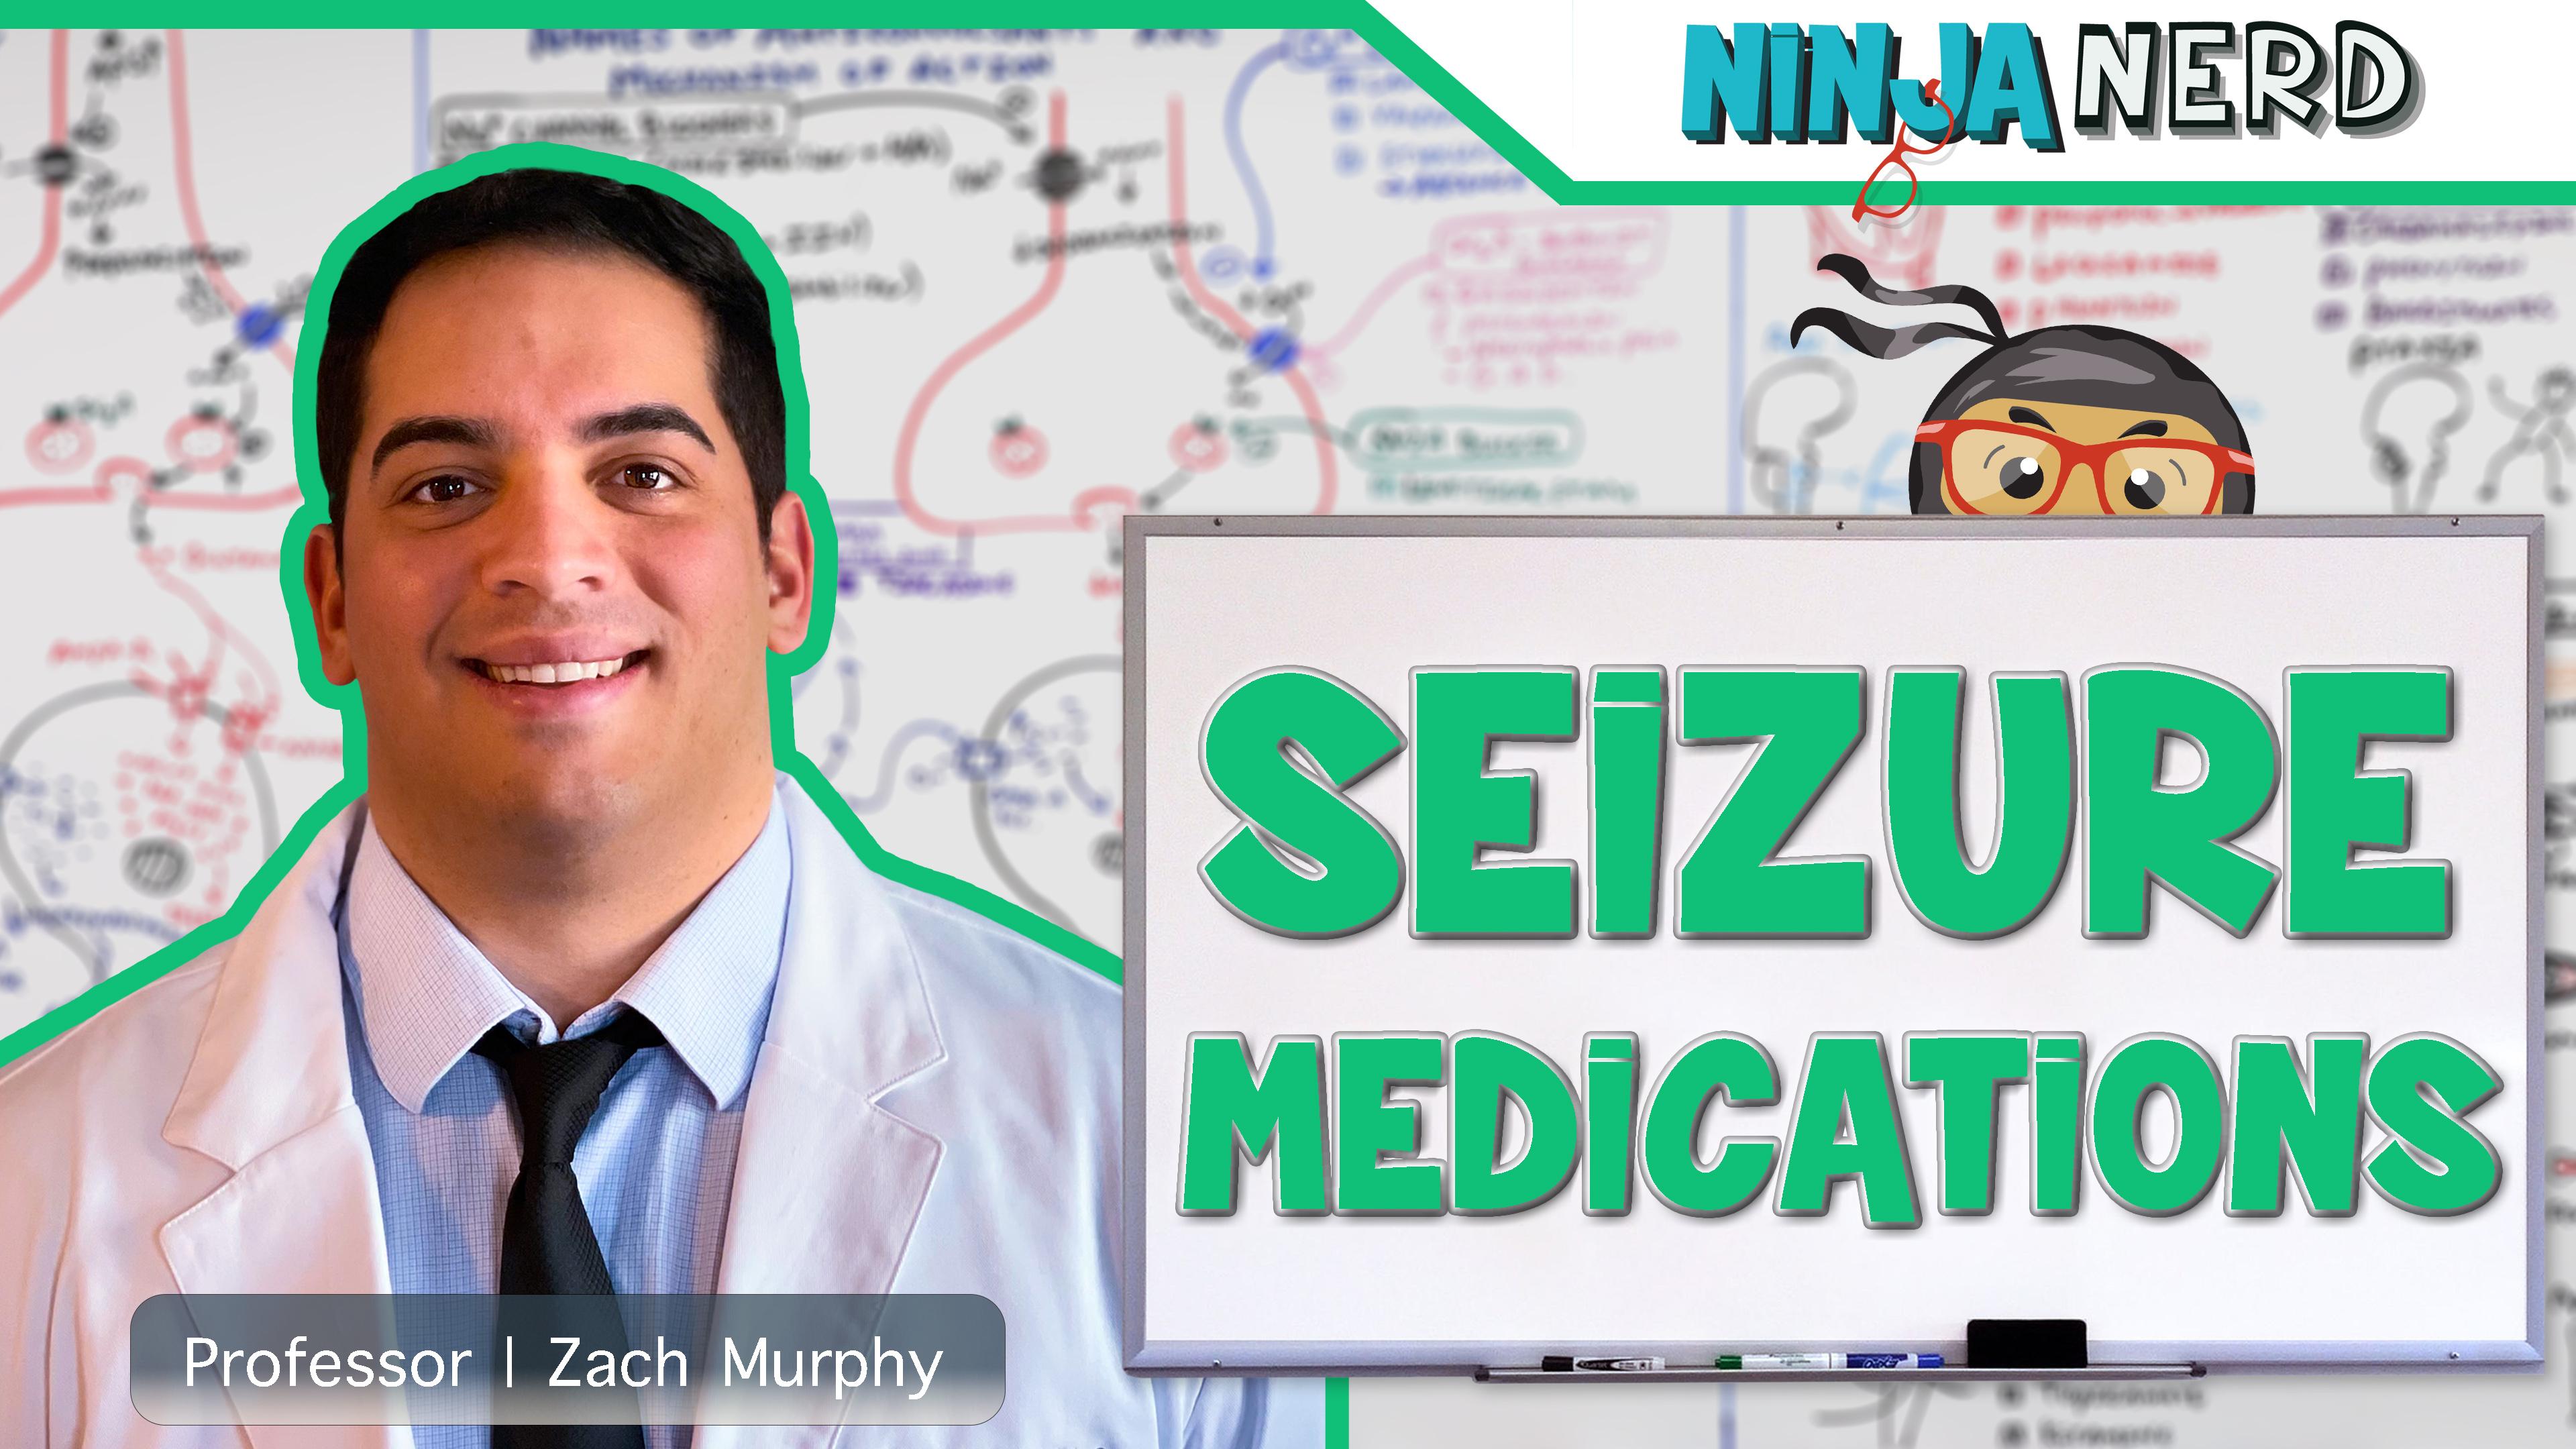 Seizure Medications | Antiepileptics